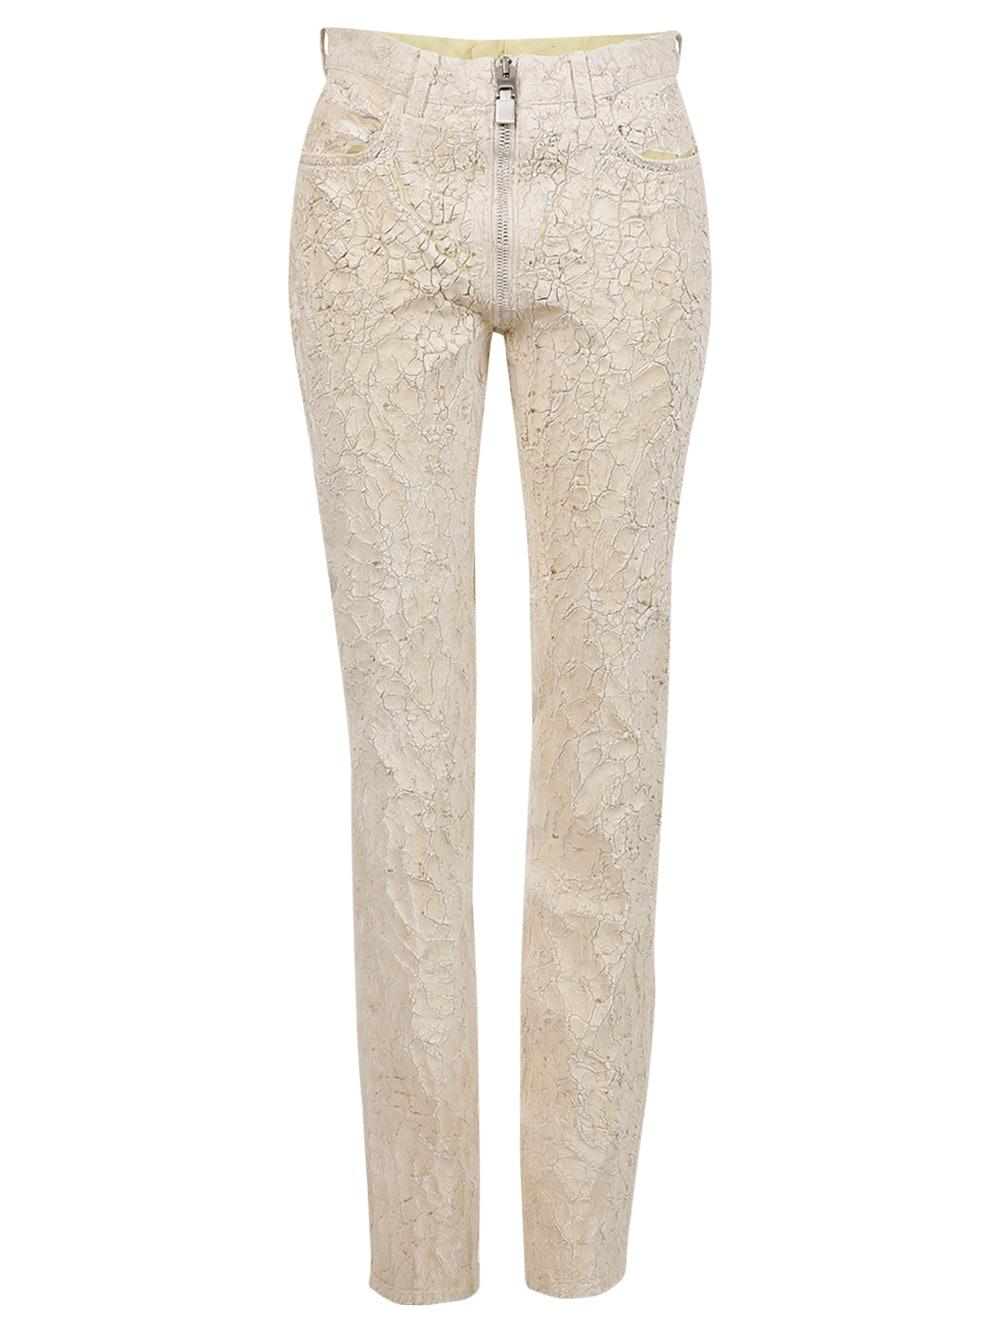 Crackled Painted Slim-fit Pants, Bone White